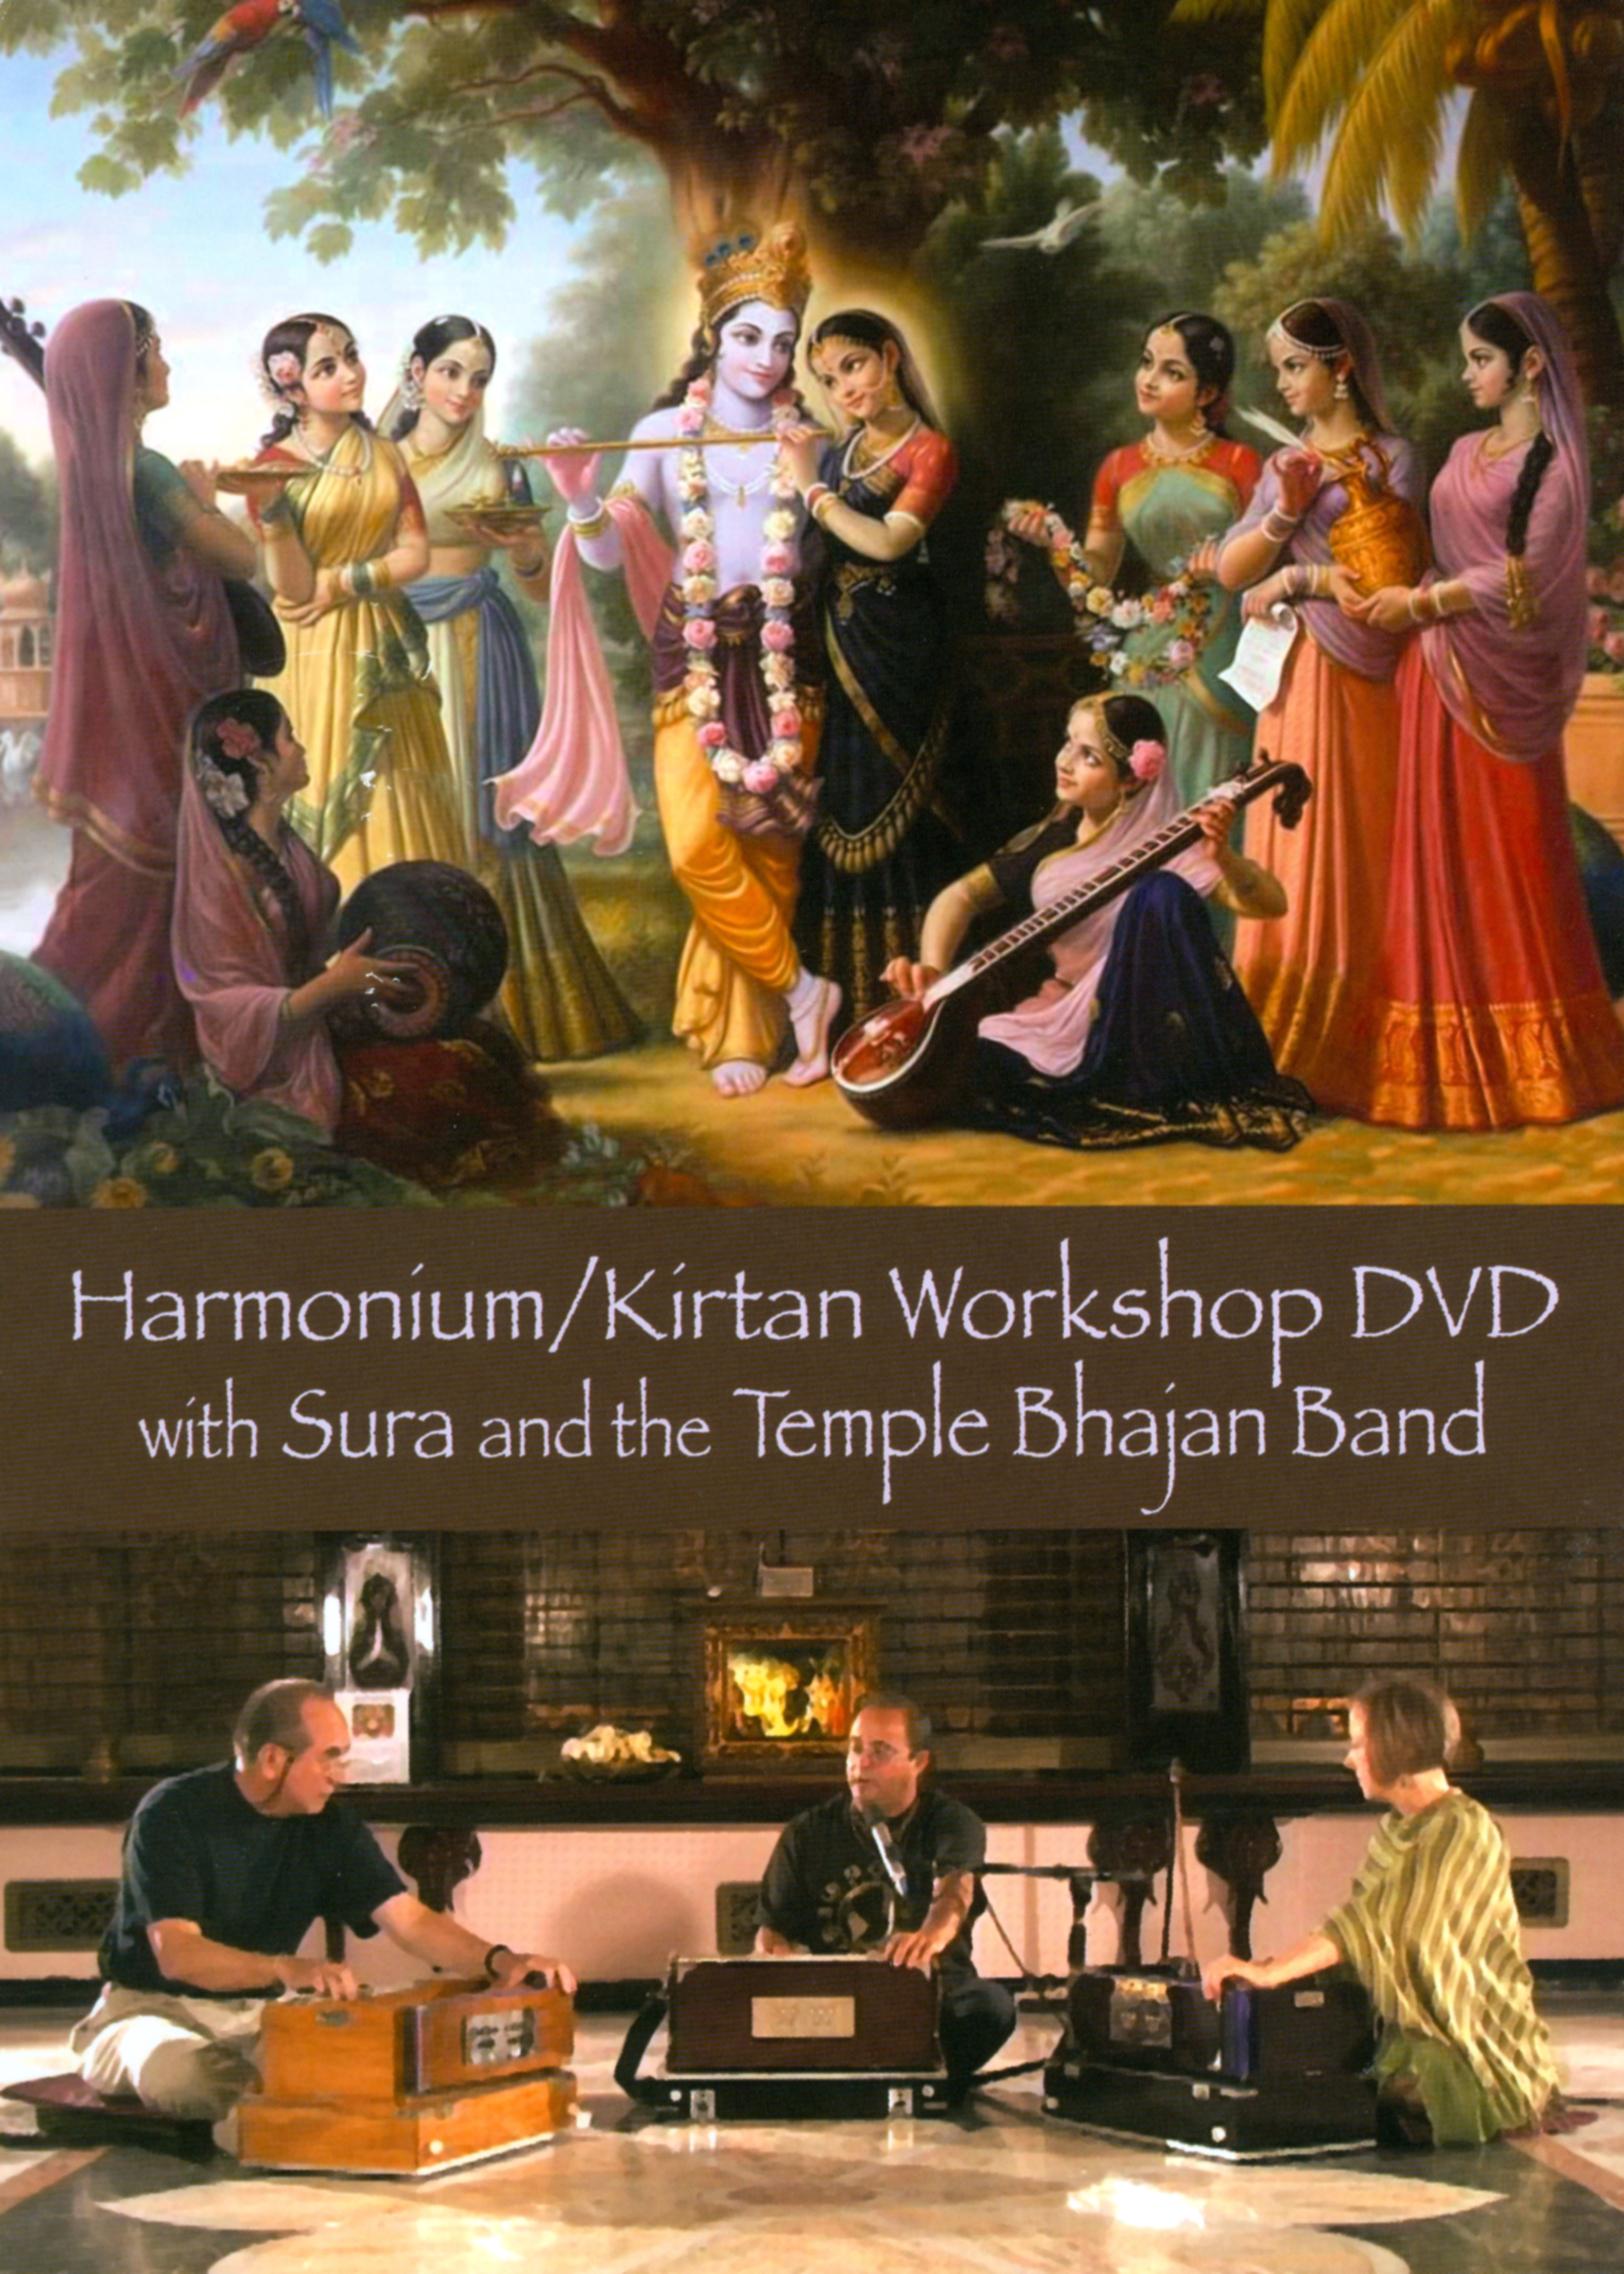 Harmonium/Kirtan Workshop DVD with Sura and the Temple Bhajan Band